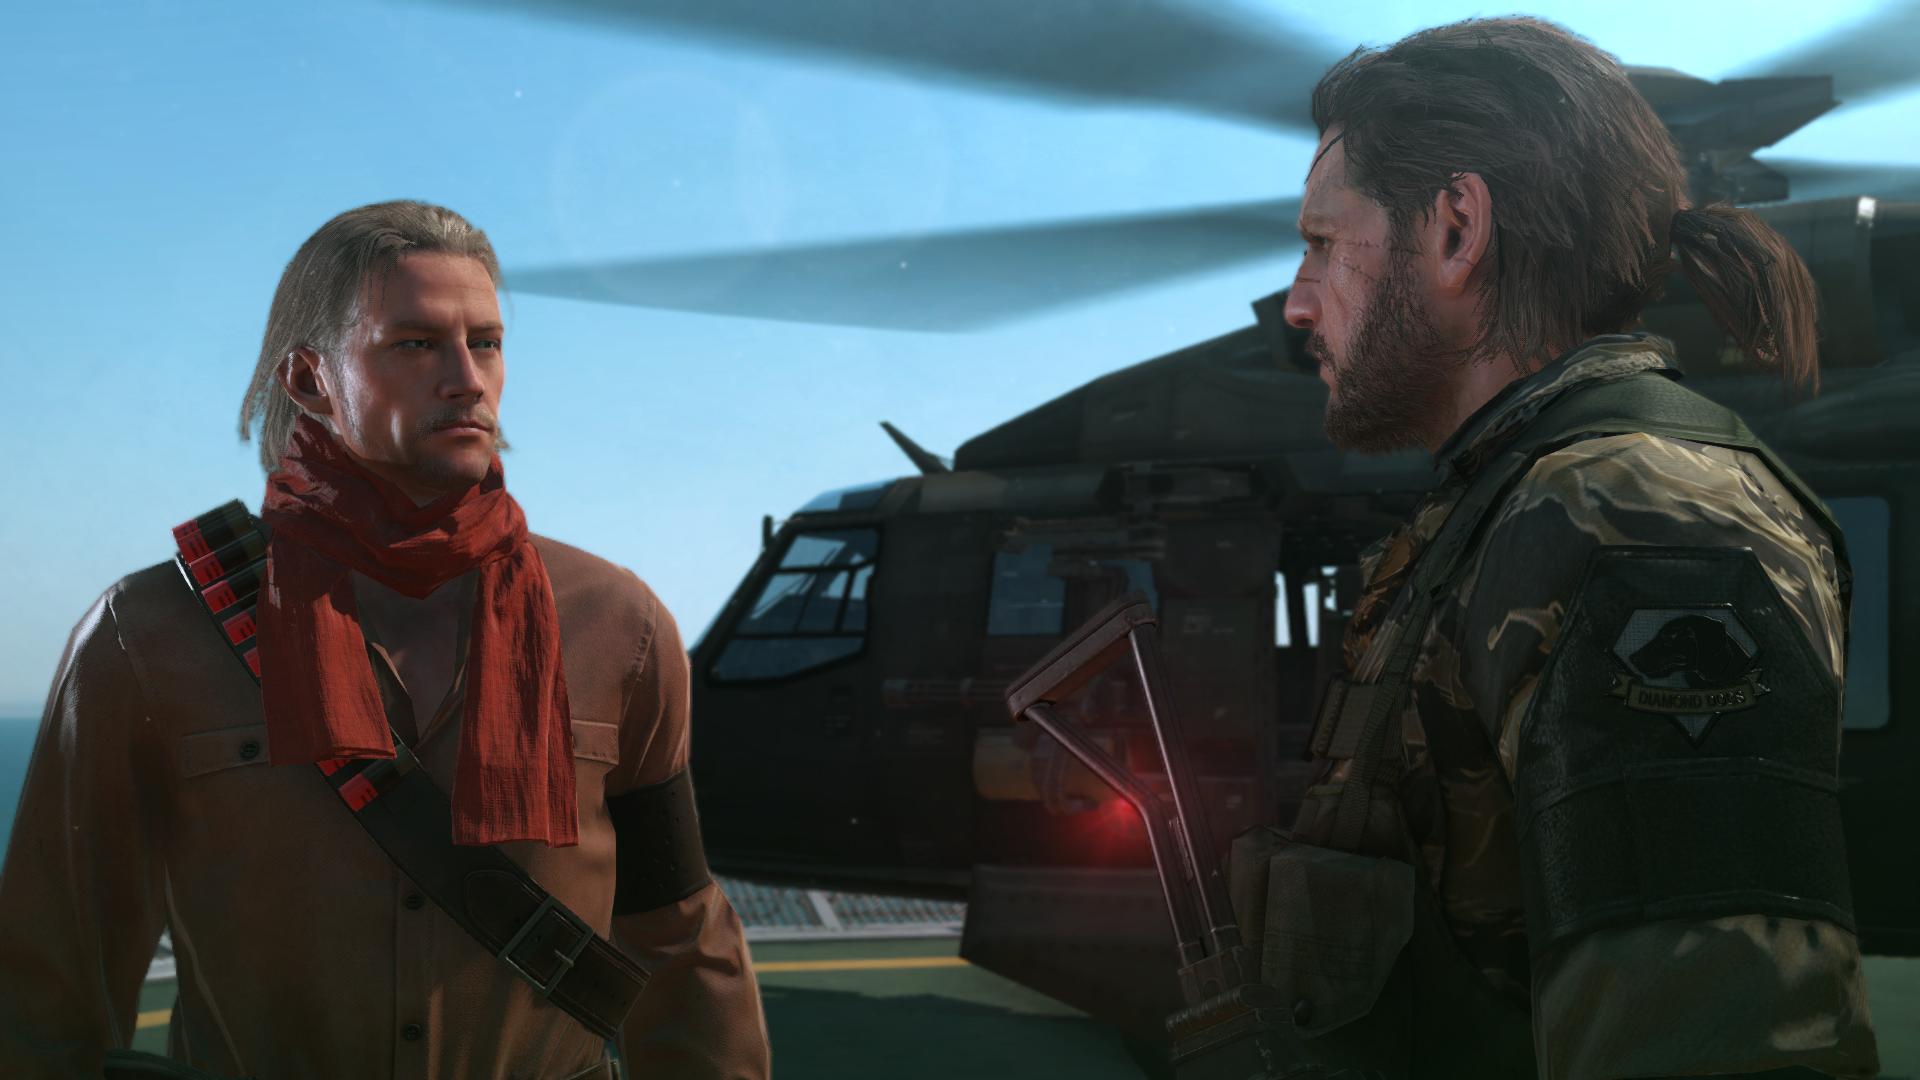 mgsvtpp_2017_07_19_20_50_16_444.png - Metal Gear Solid 5: The Phantom Pain